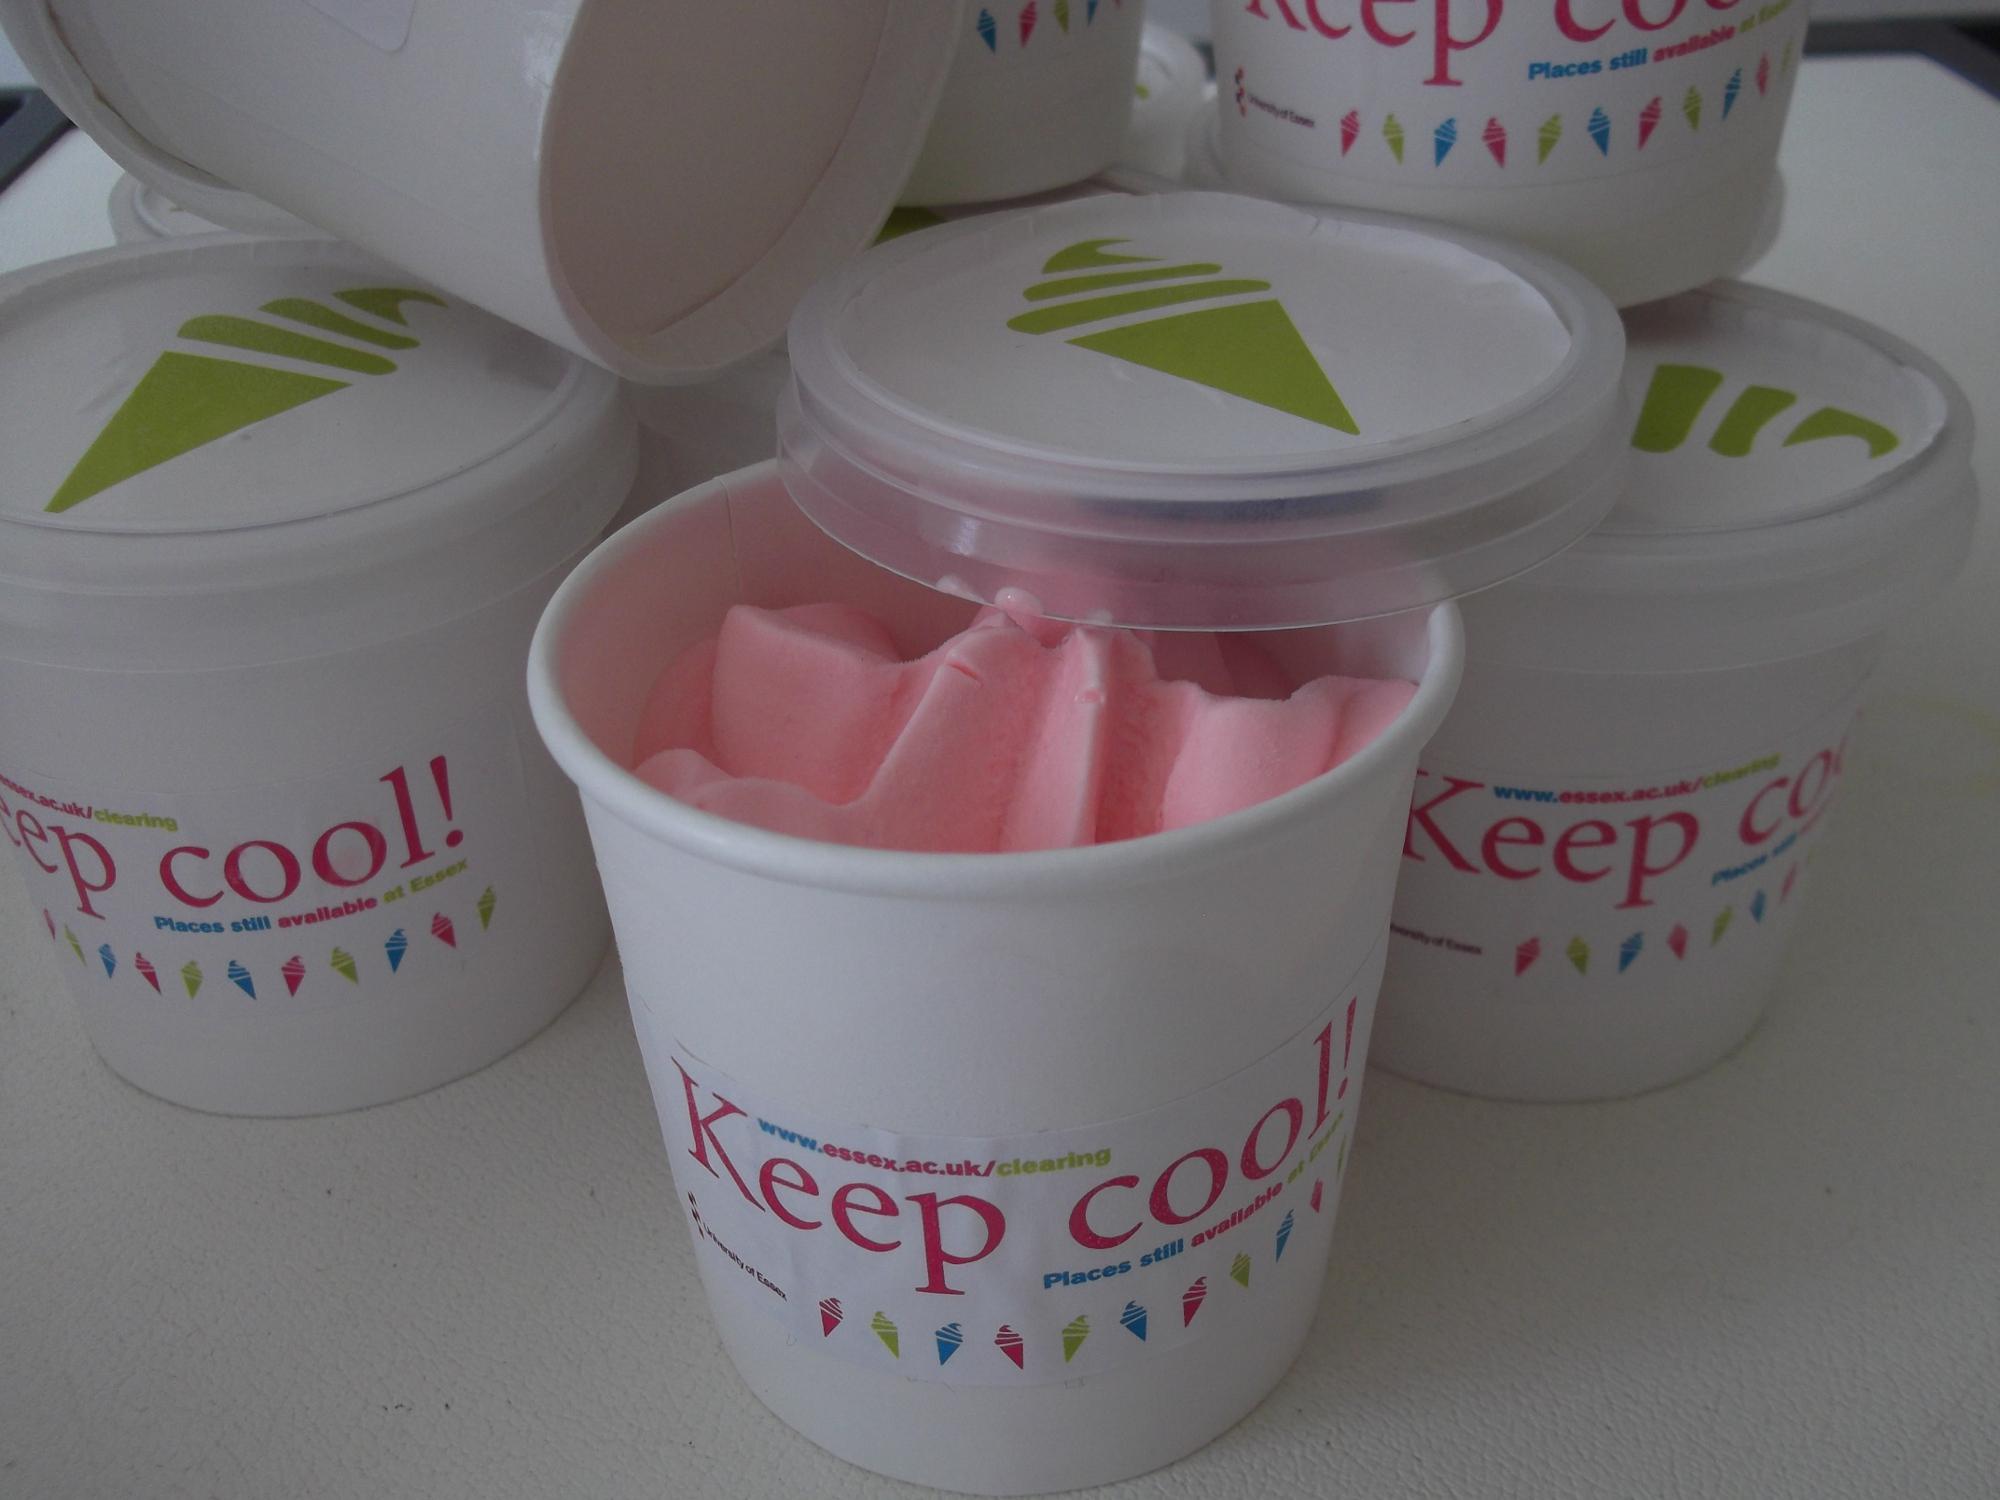 branded-pots-of-ice-cream